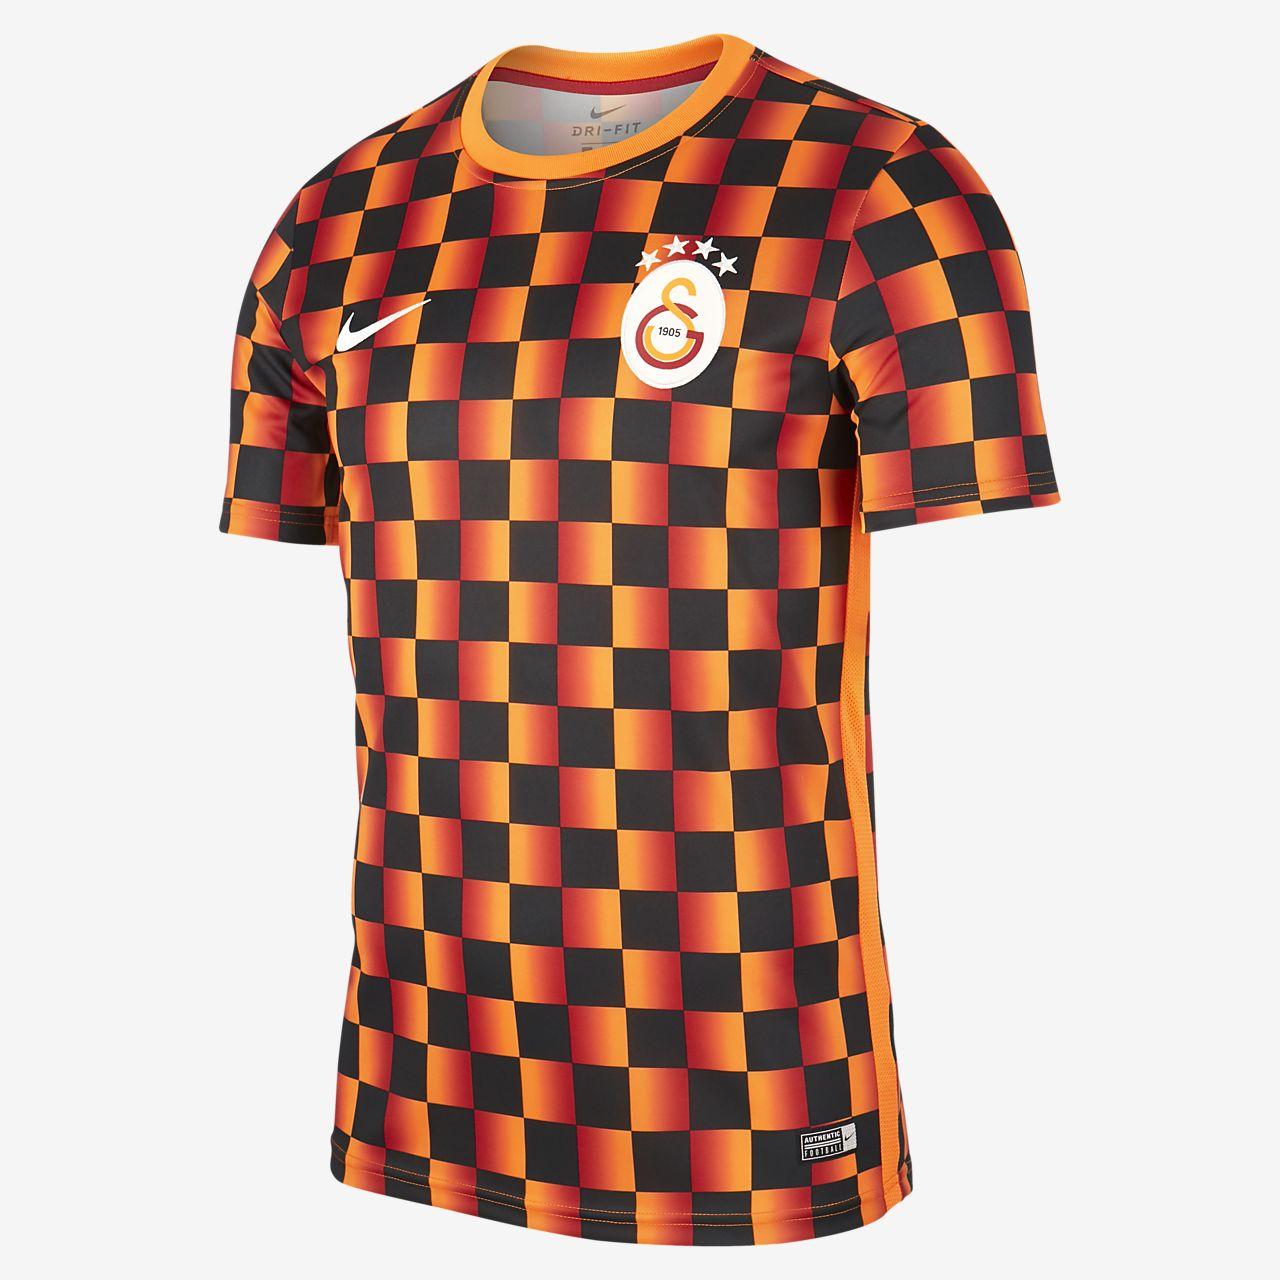 Galatasaray Men's Short-Sleeve Football Top